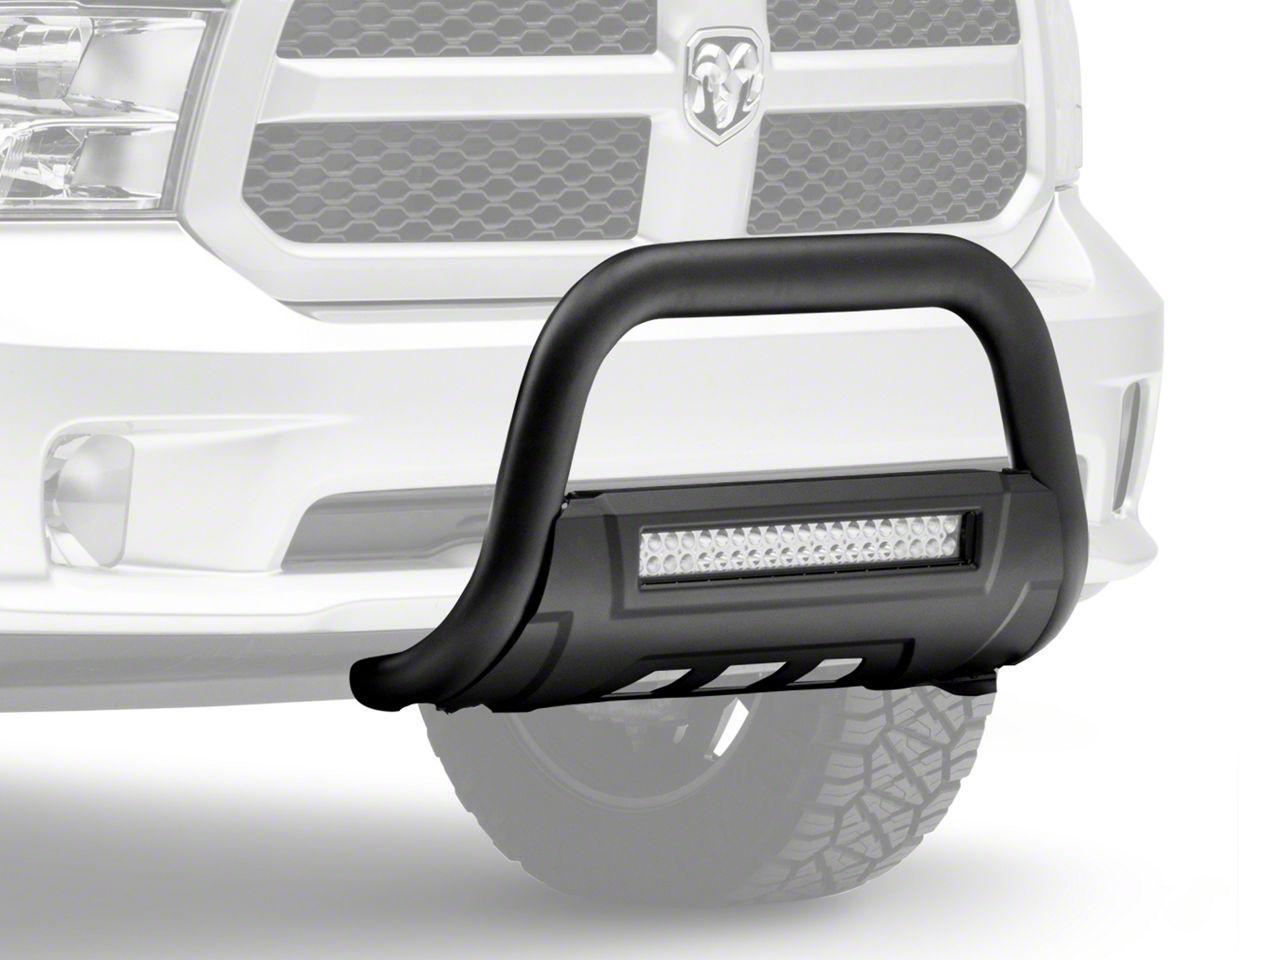 2008-18 Chrome Fits Ram 1500 Future Trucks Bull Bar High Grade Steel Construction with Skid Plate /& LED Light